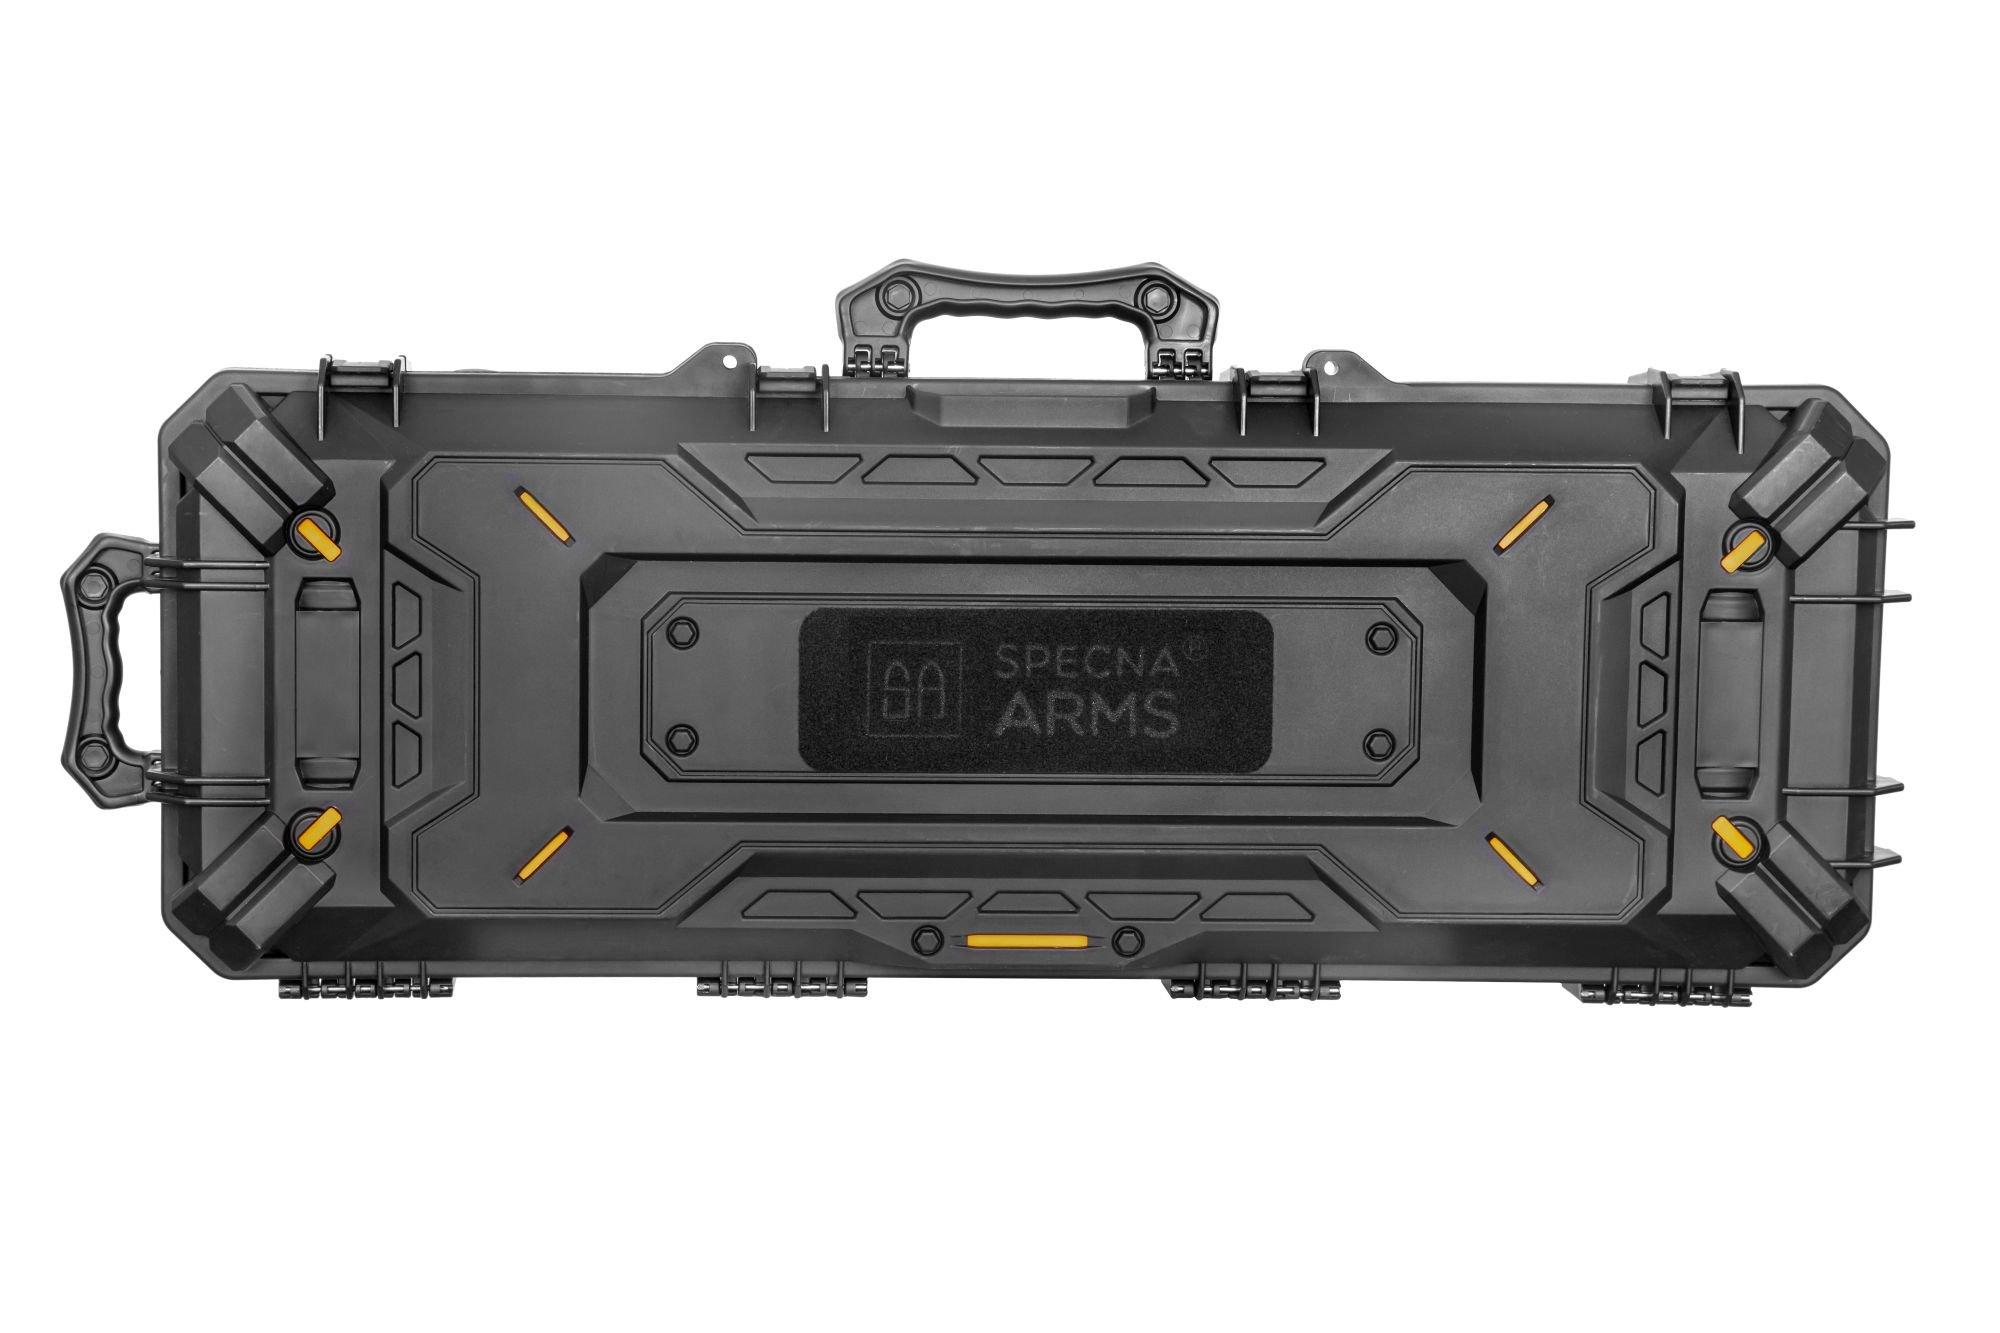 walizka typu hard case specna arms